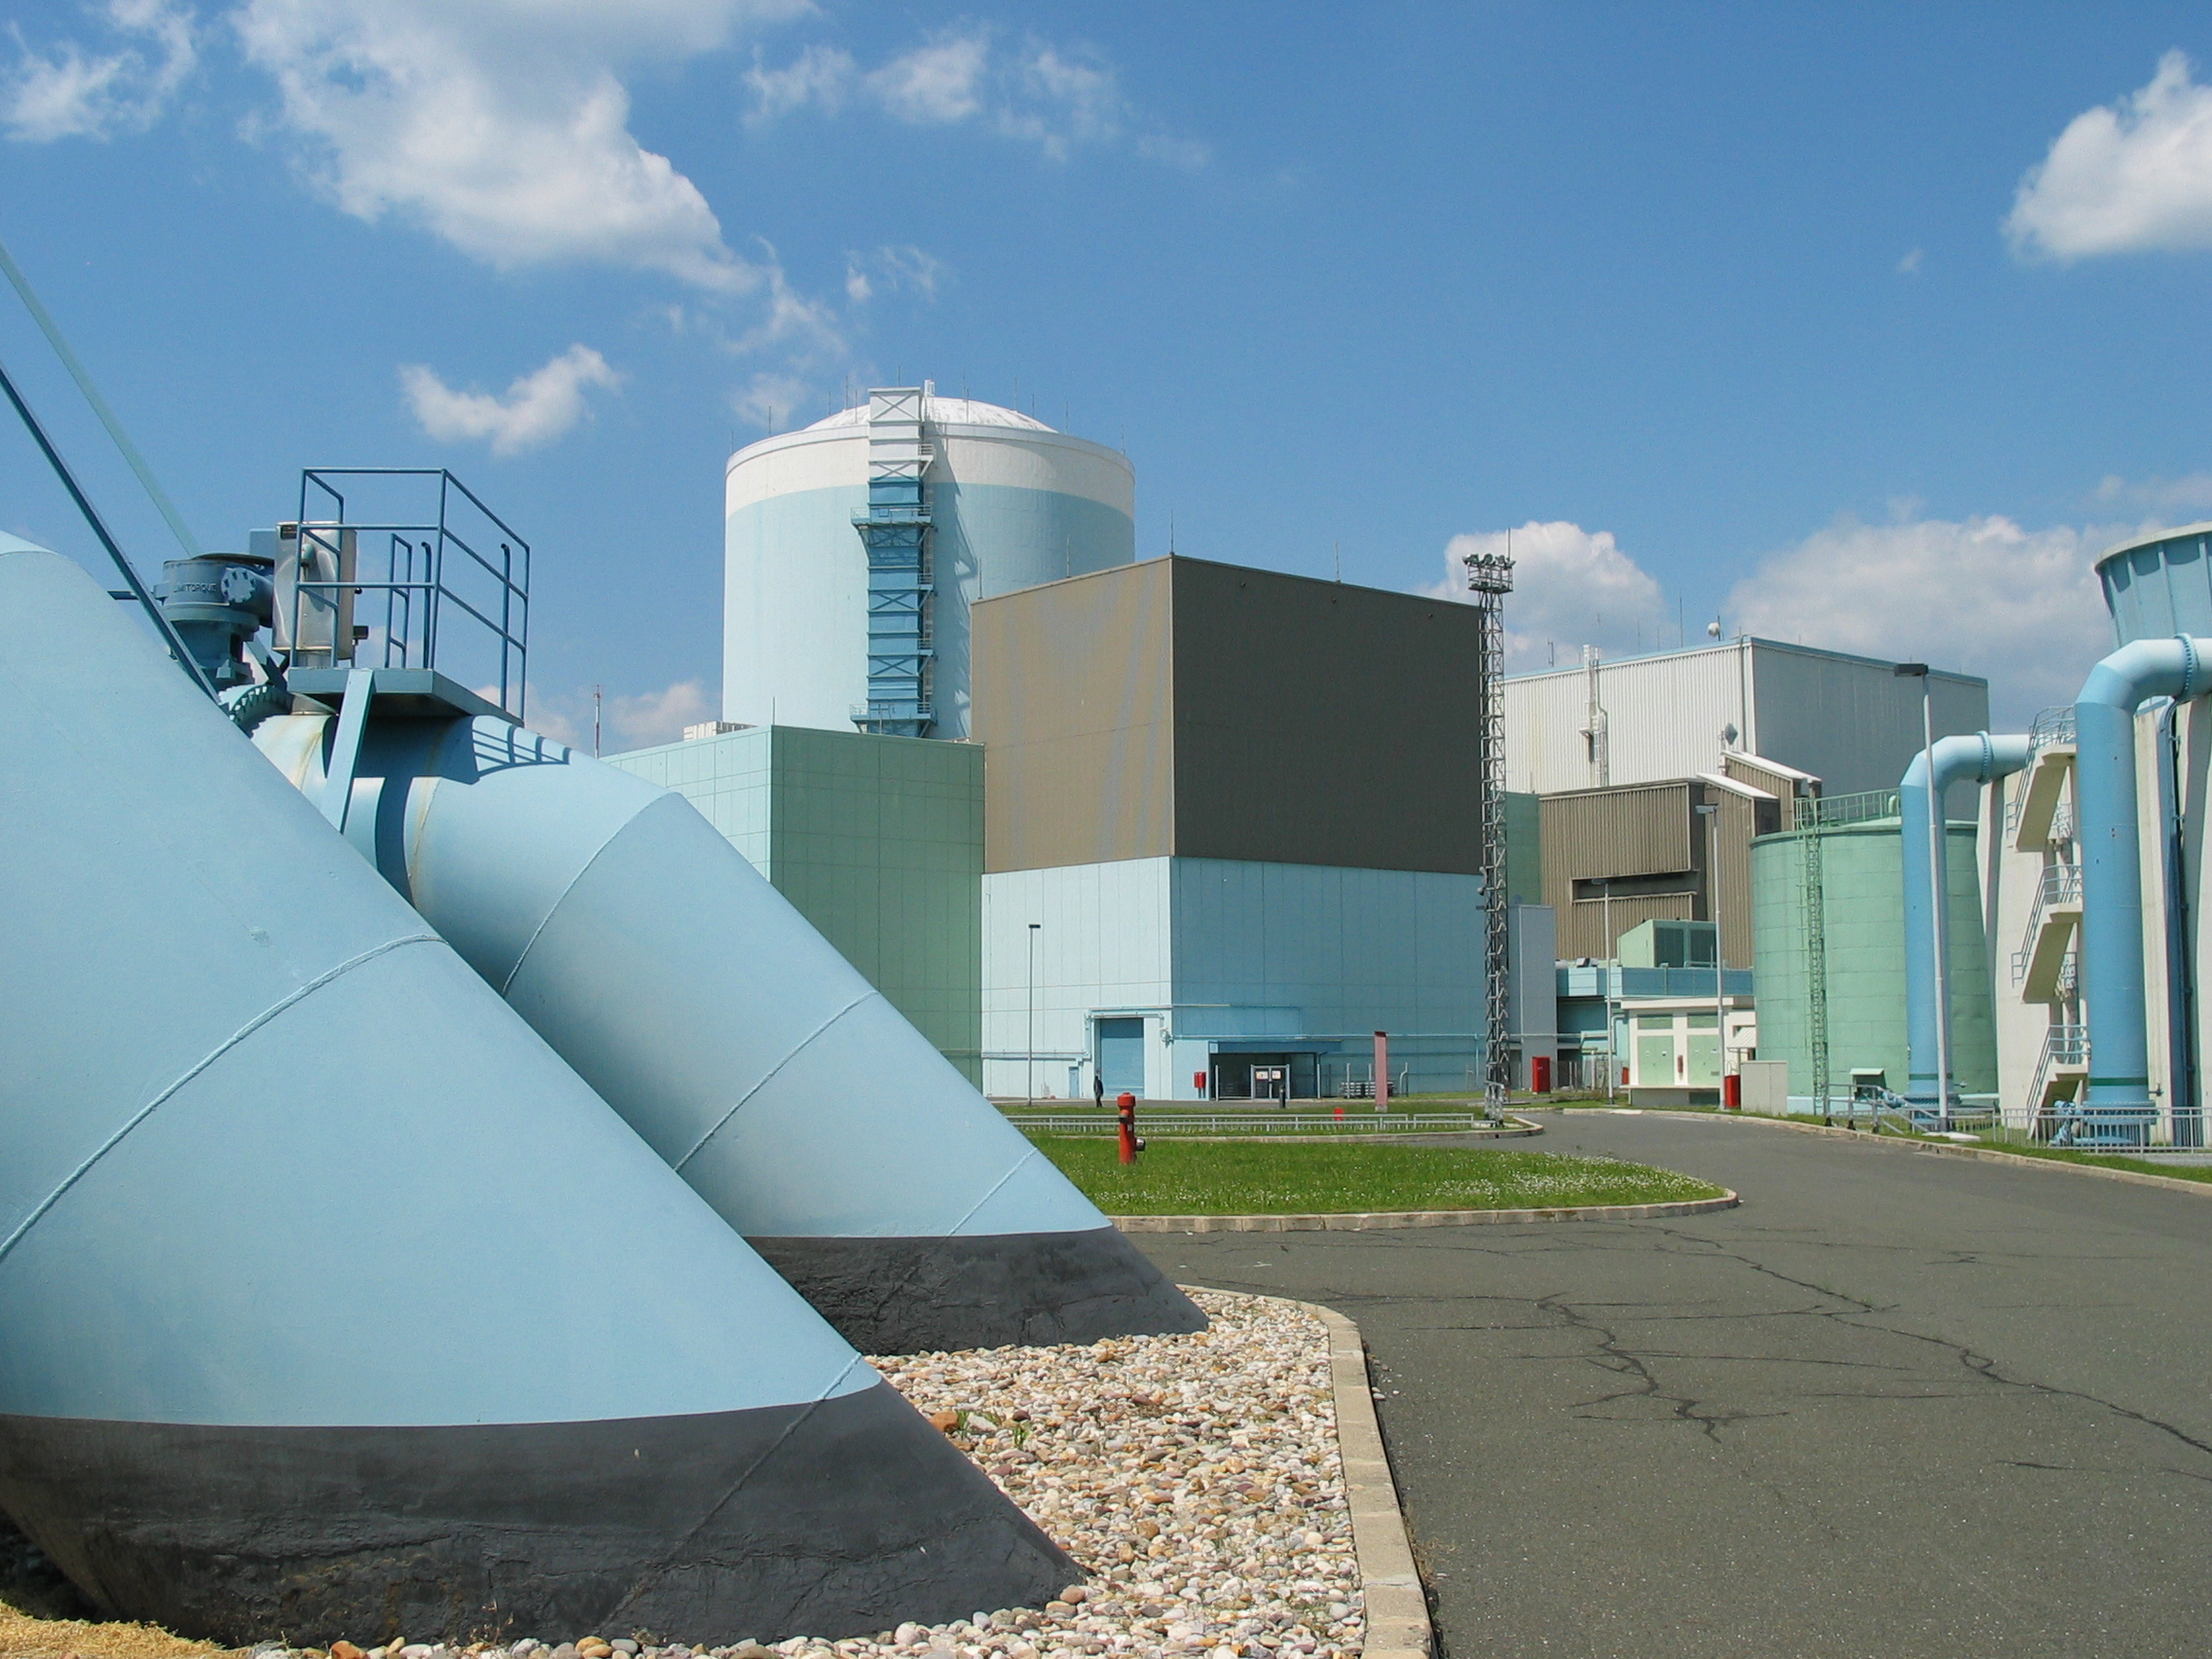 Slovinská jaderná elektrárna Krško má nový ventilační systém